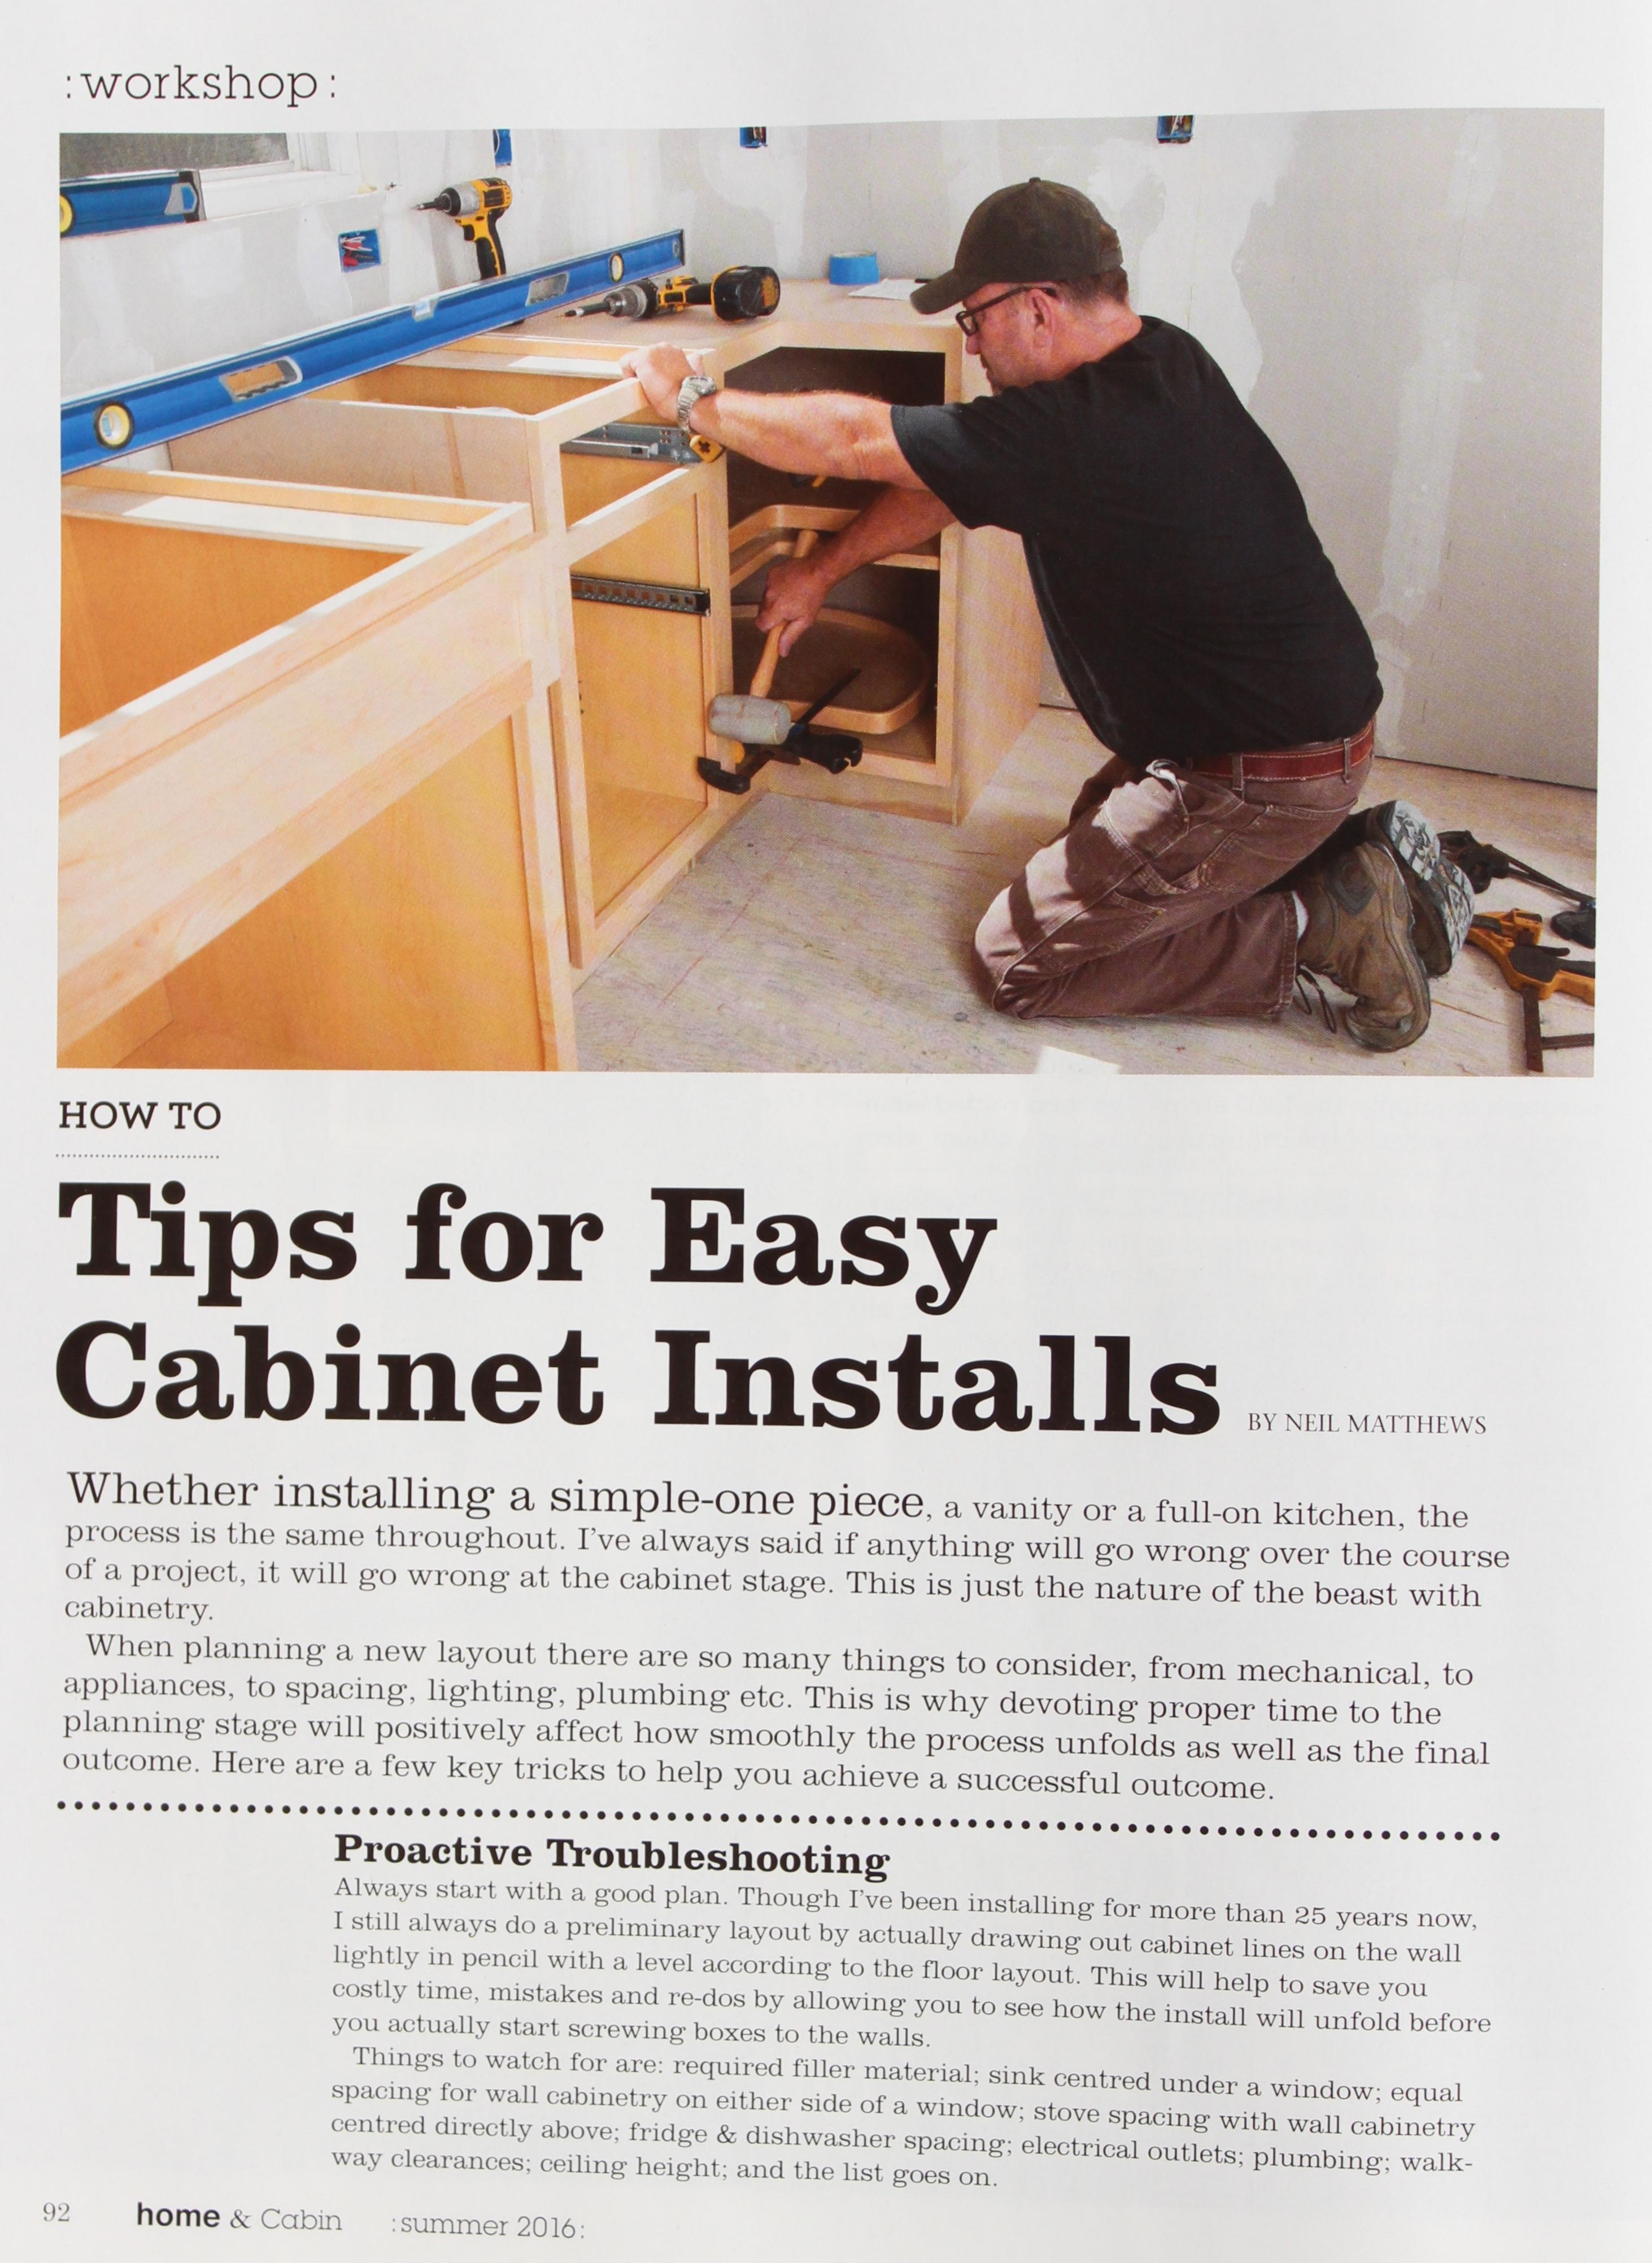 Tips For Easy Cabinet Installs